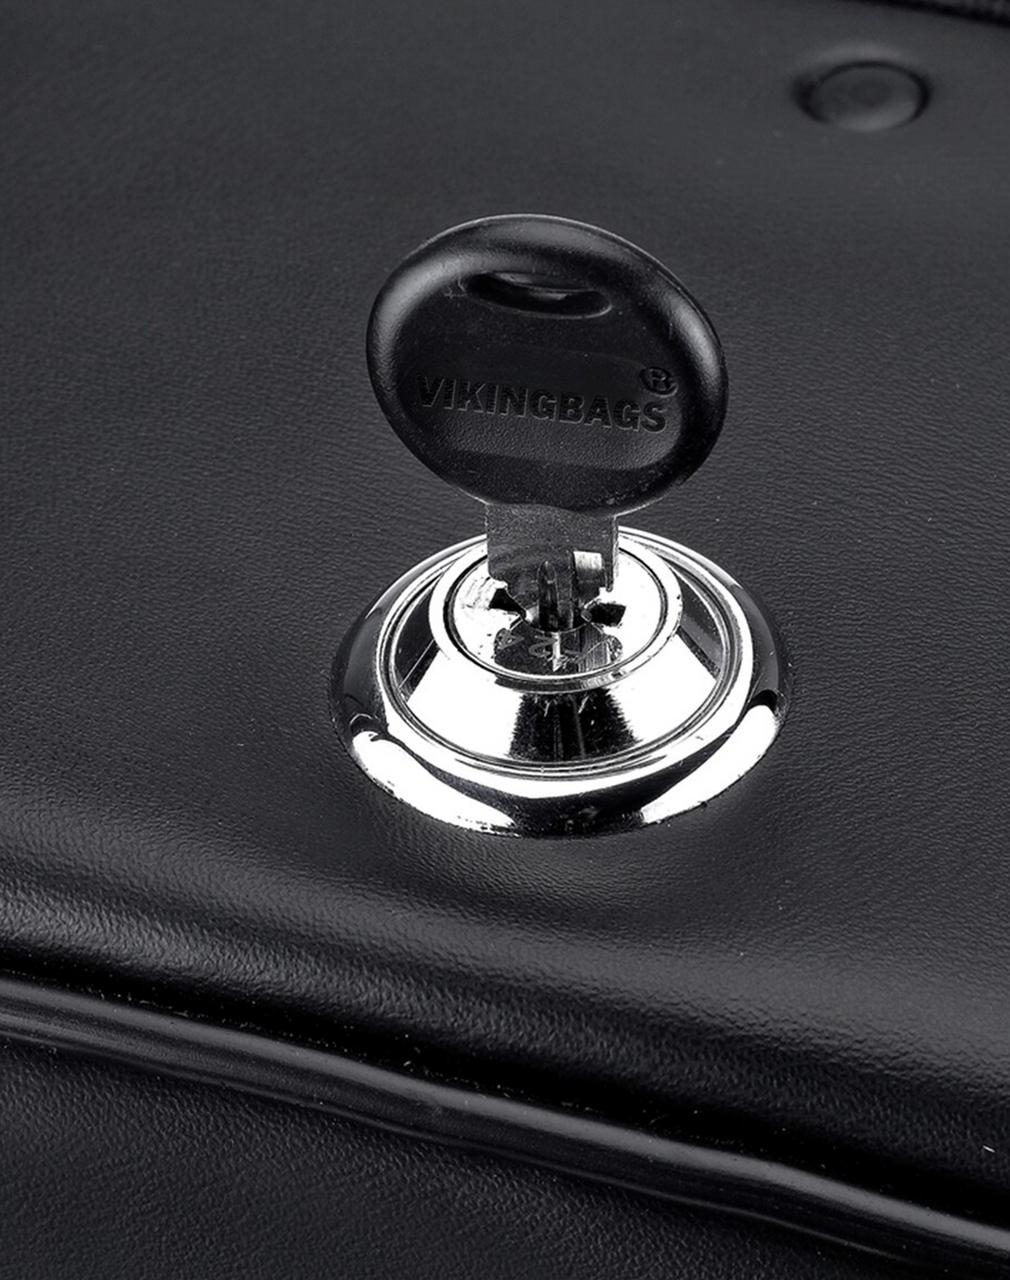 Honda VTX 1800 F SS Shock Cutout Slanted Studded Large Motorcycle Saddlebags Key Lockable View